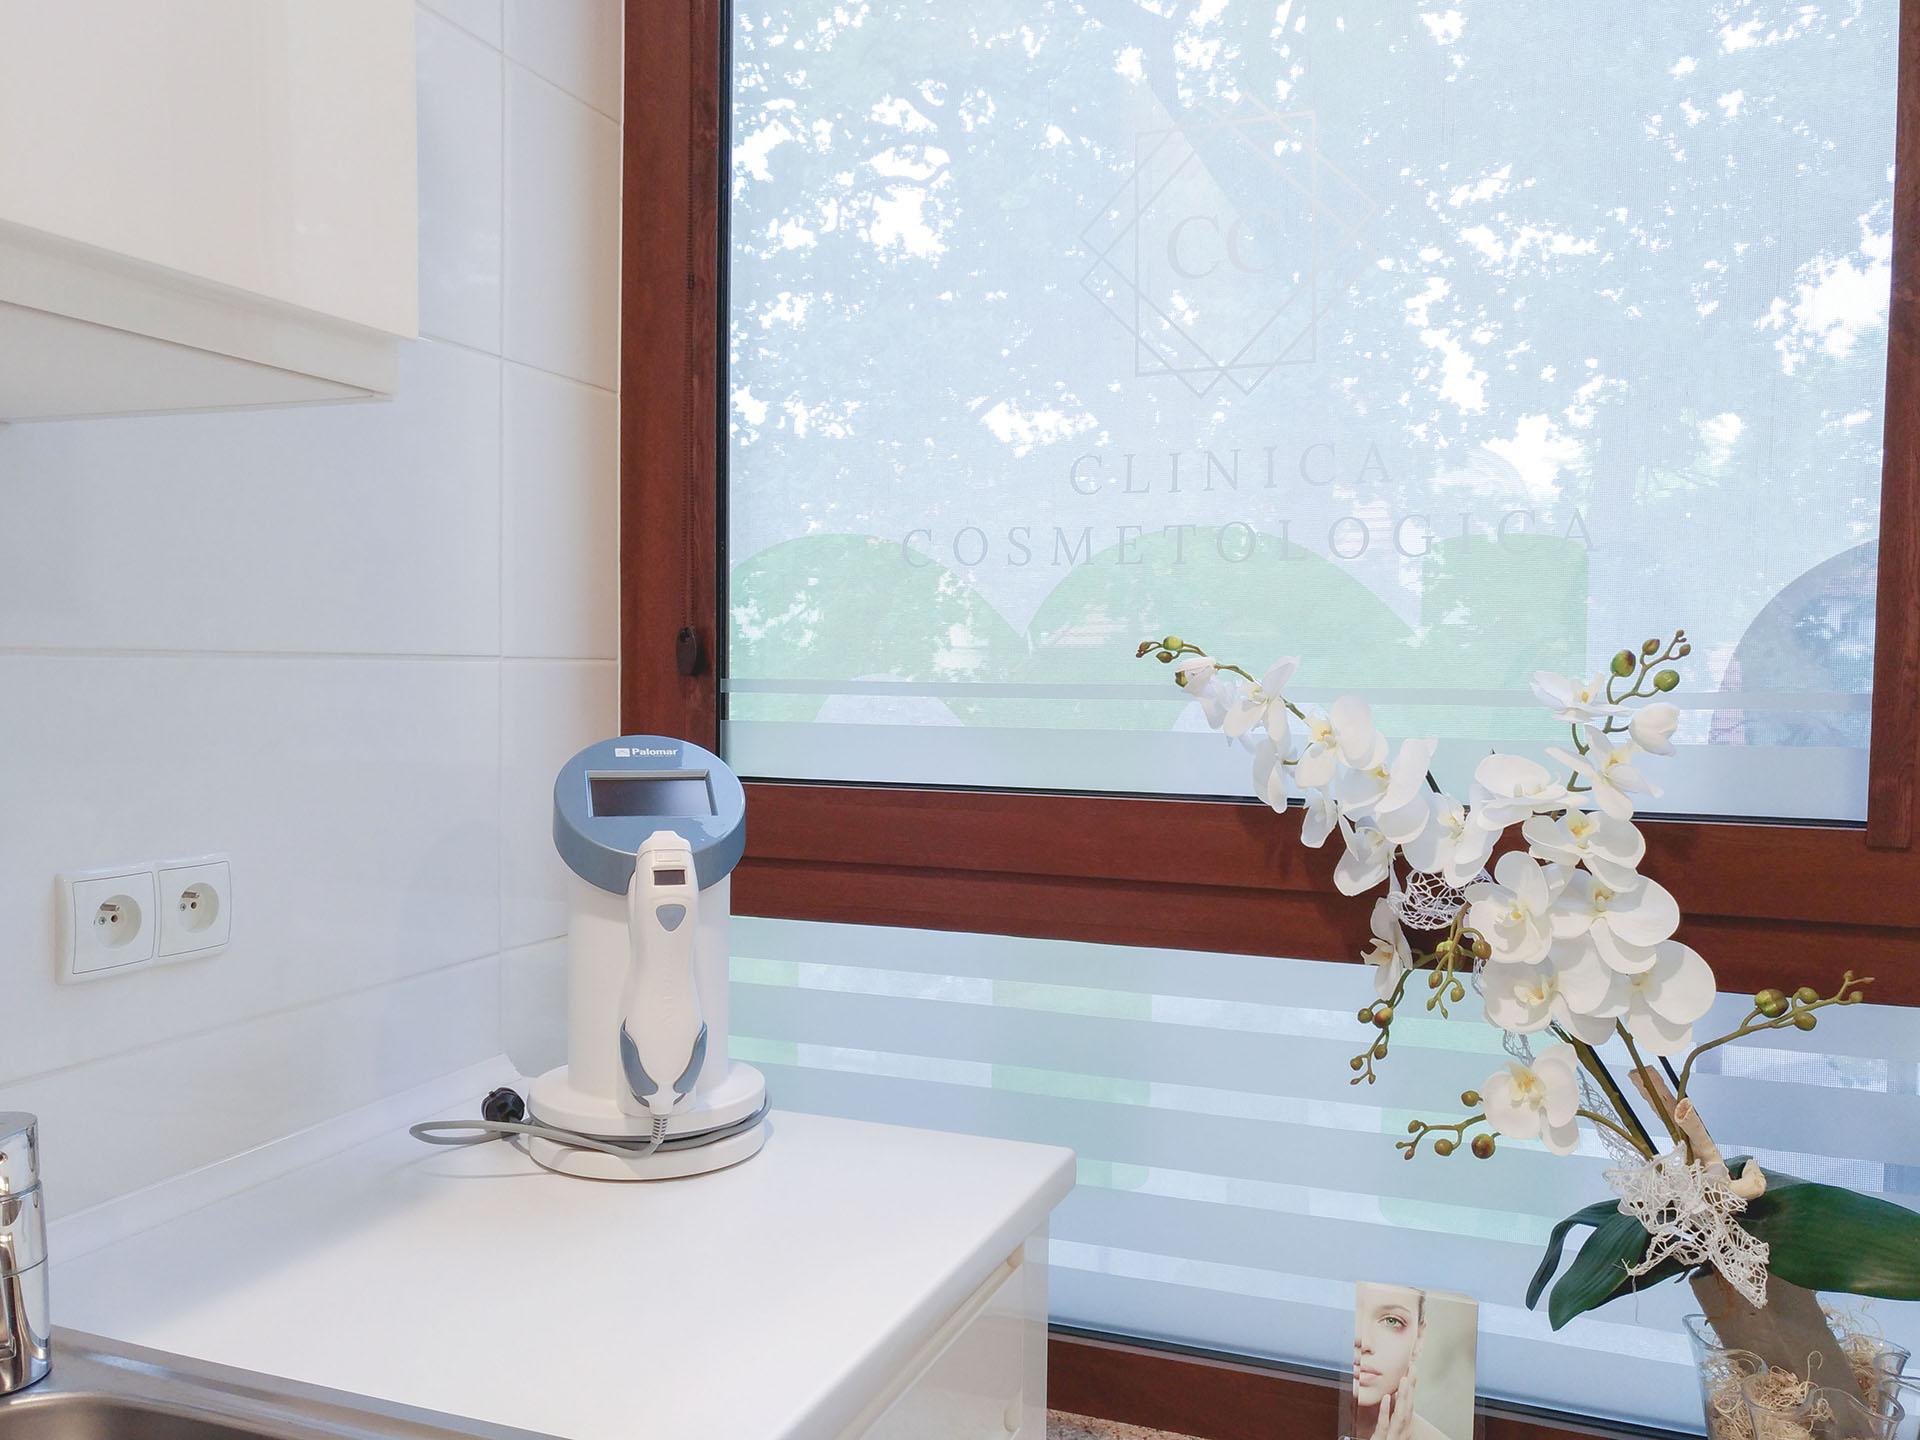 laser polomar emerfe, clinica cosmetologica gdańsk